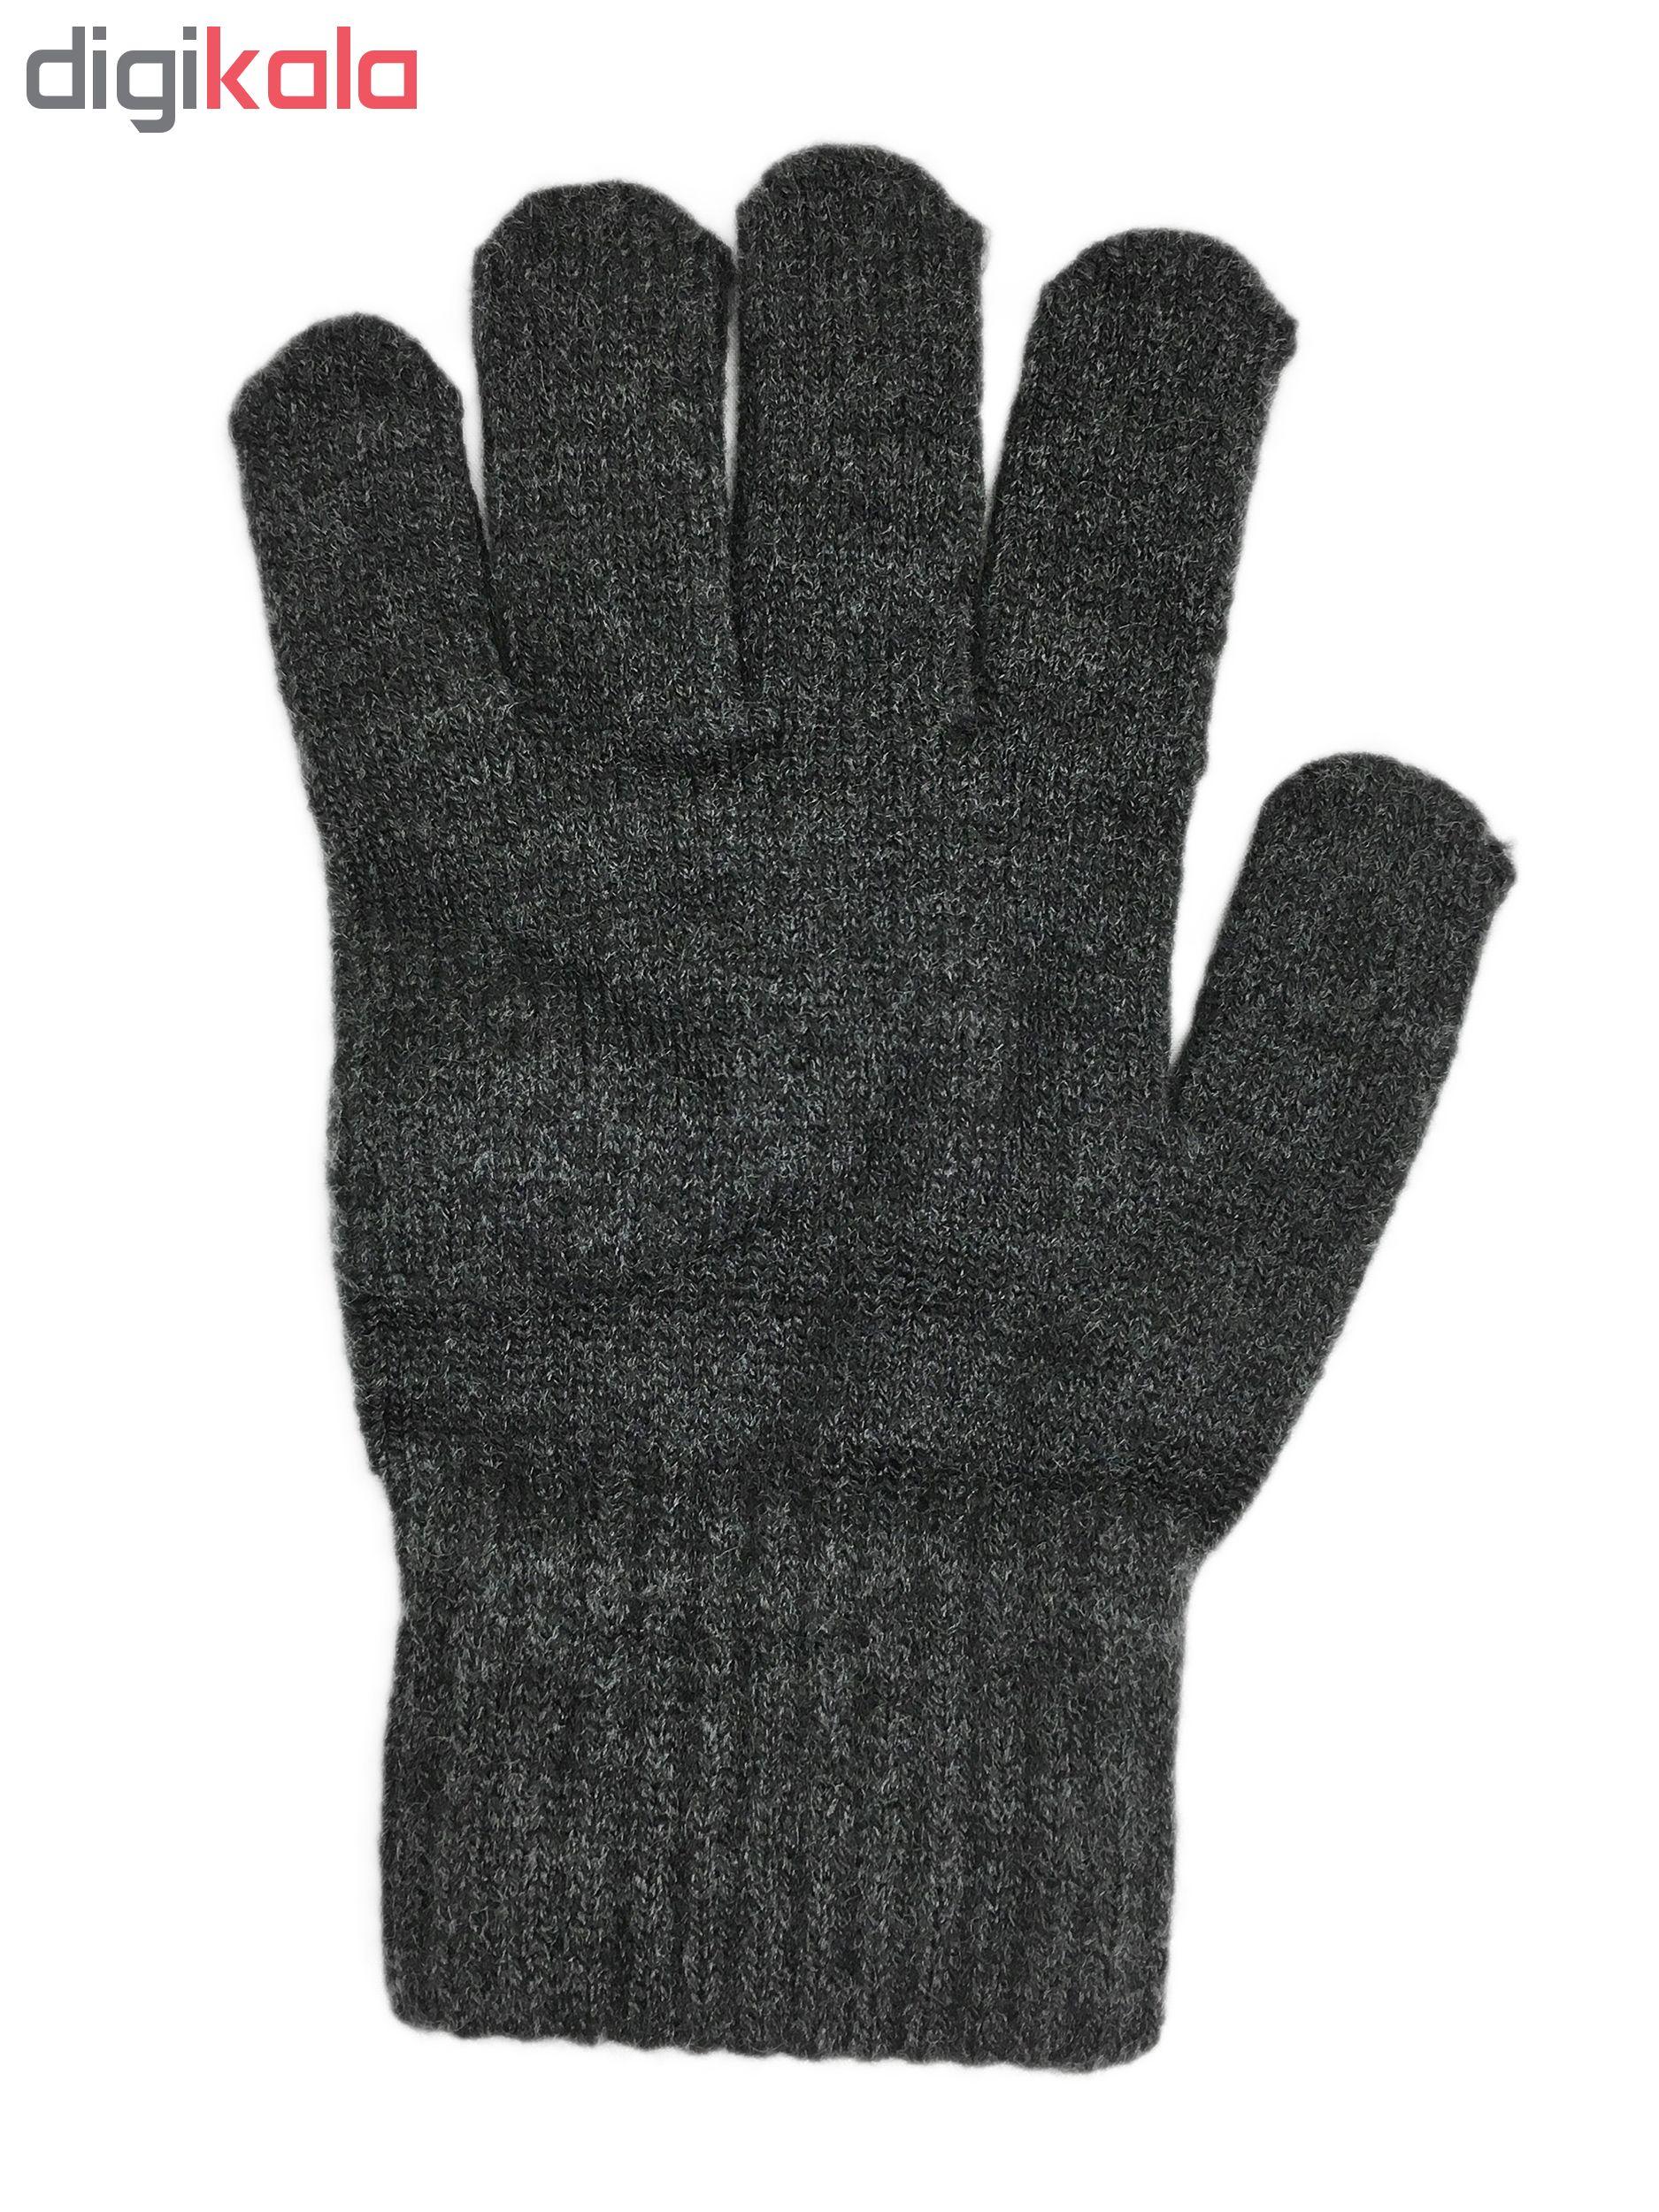 دستکش کد K006